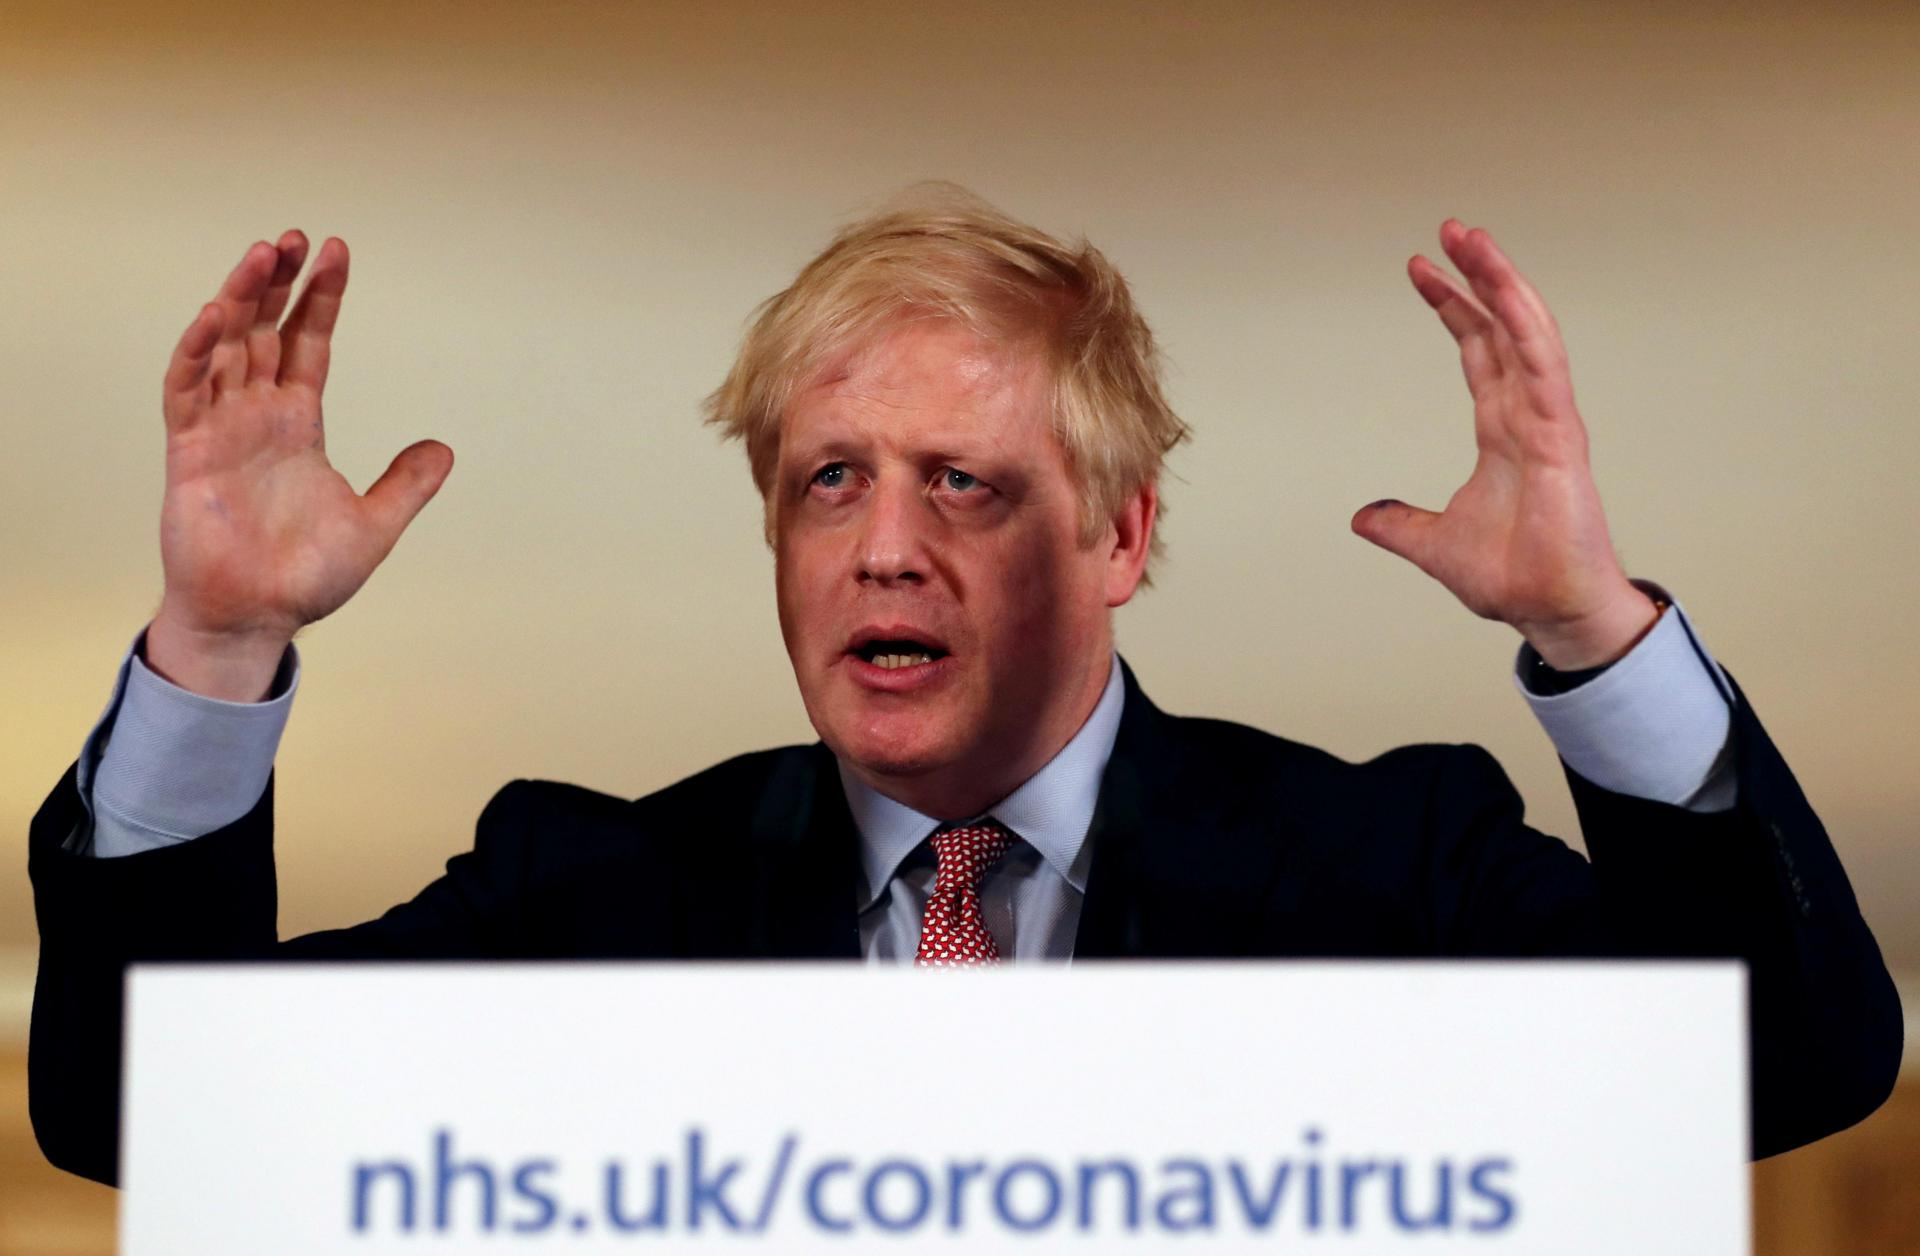 Boris Johnson has pushed the idea of fostering 'herd immunity'. Photo: AFP